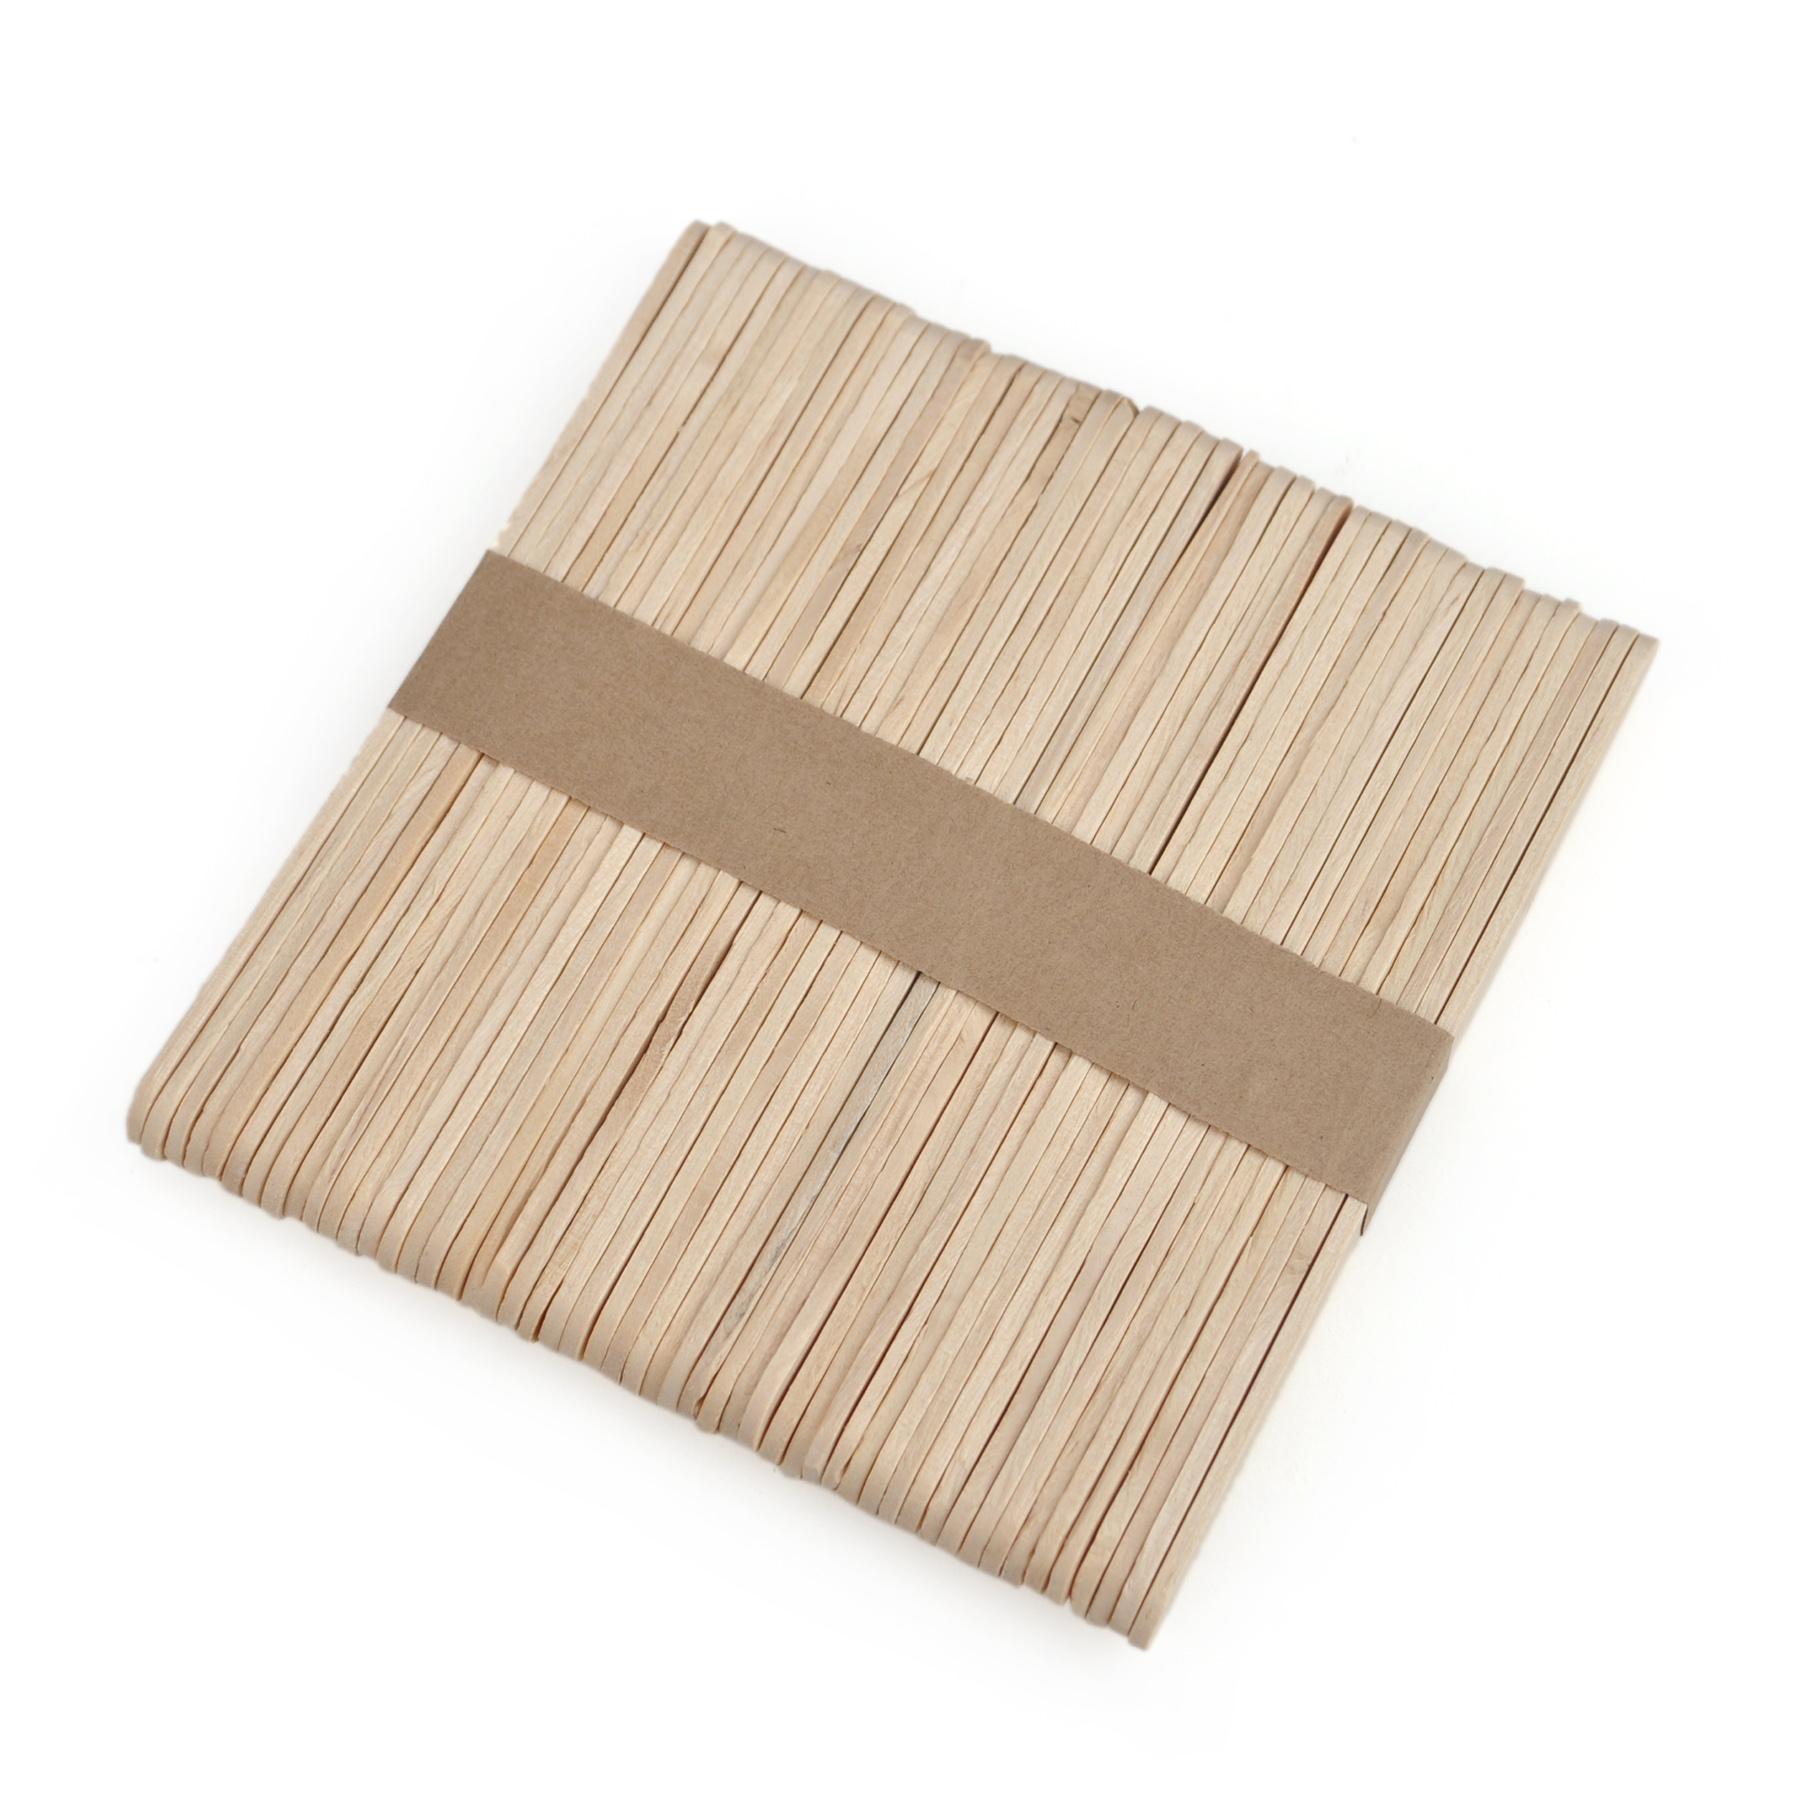 Aspire wood craft sticks popsicle sticks for Wooden craft supplies wholesale